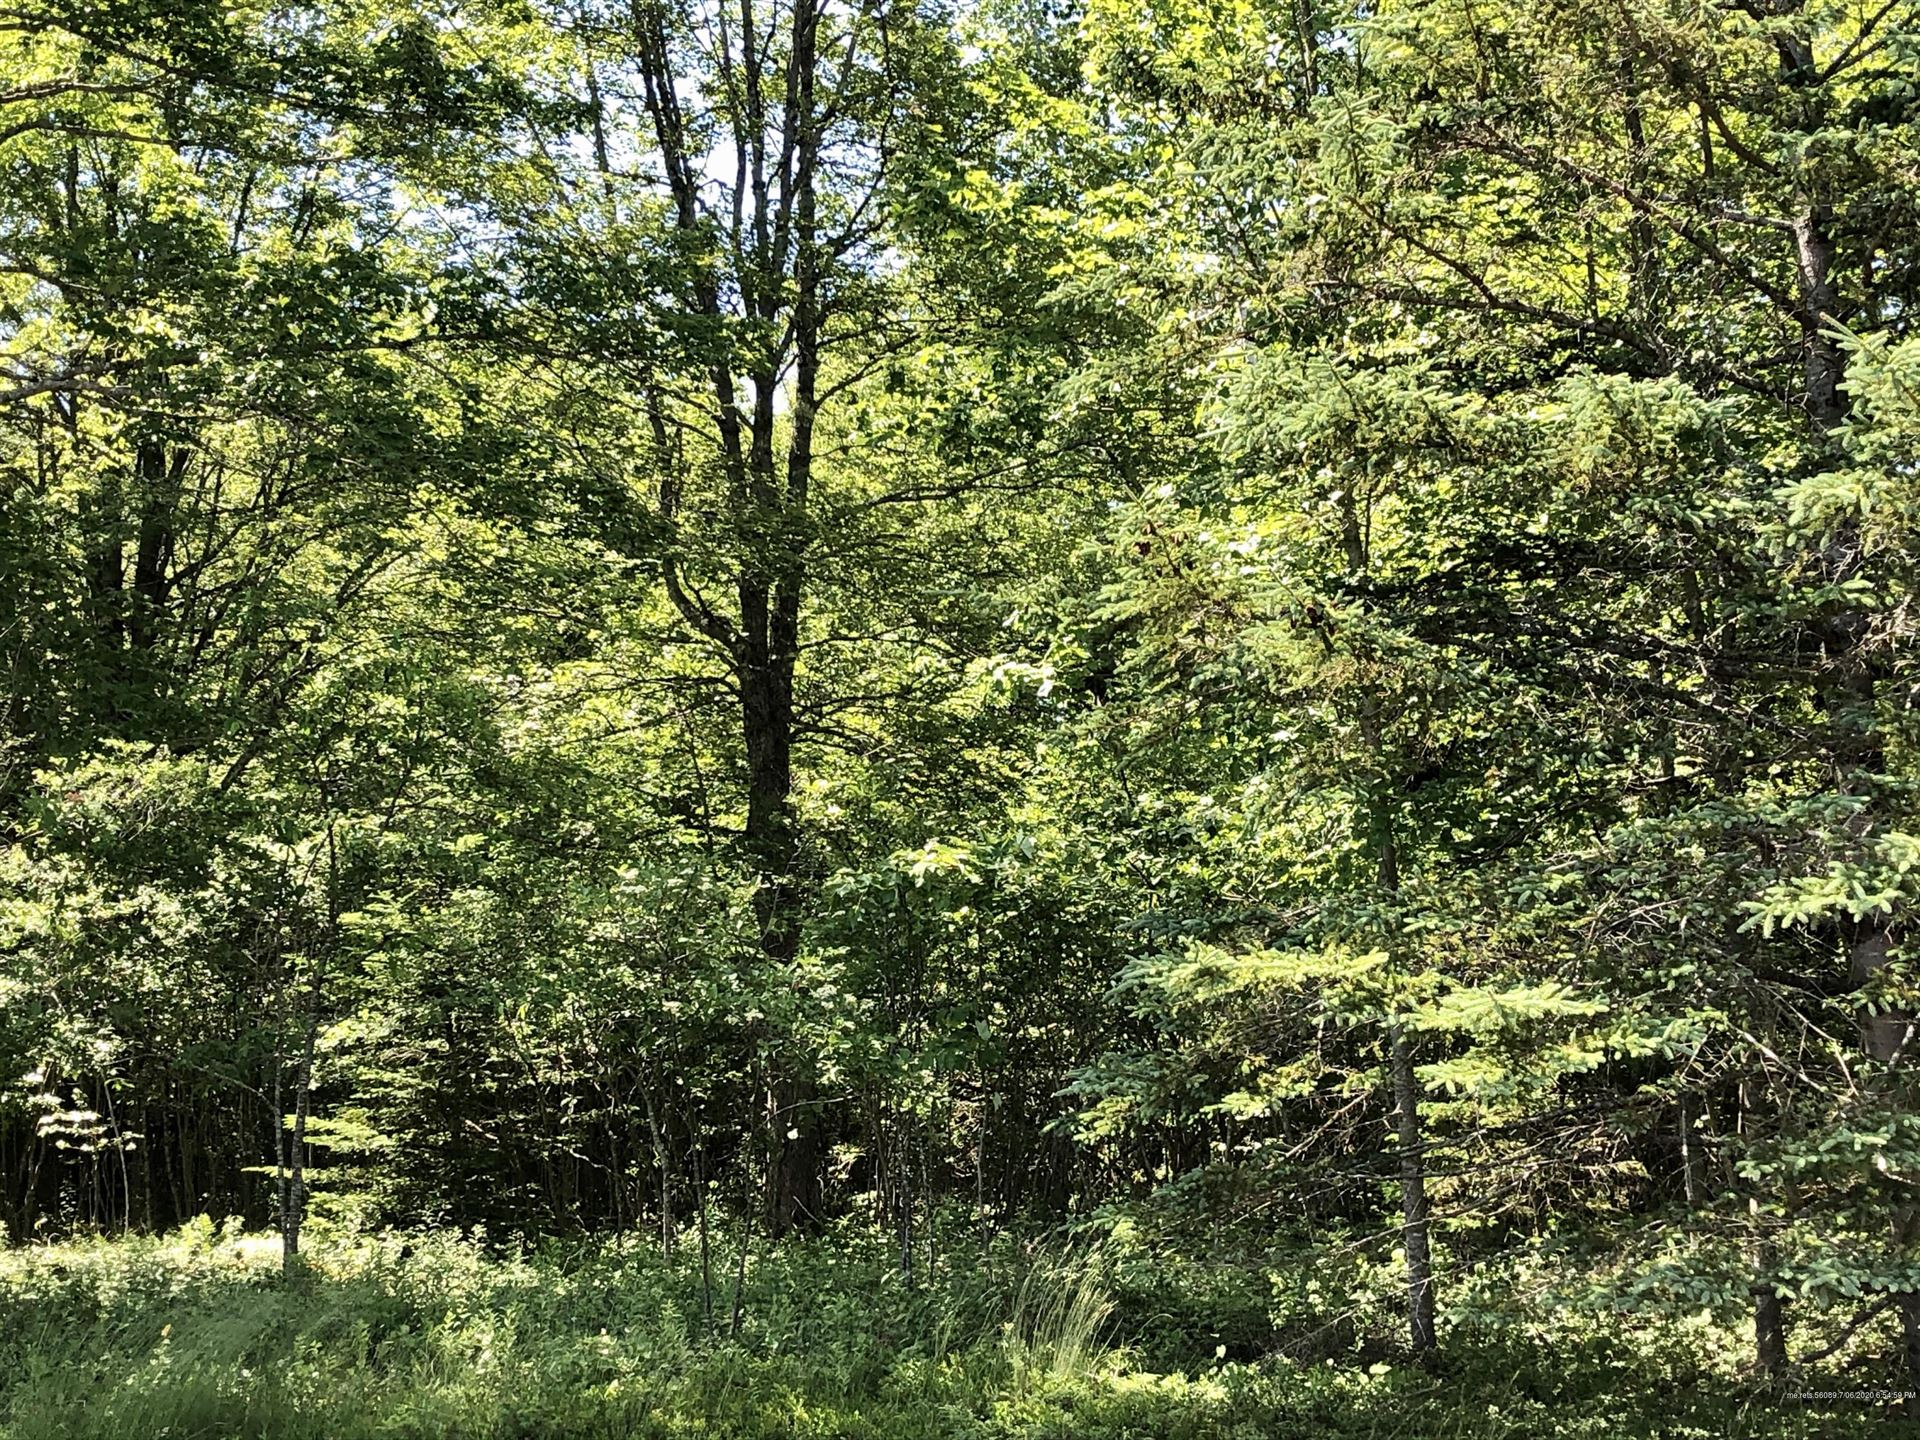 Photo of 0 Tremont Road, Tremont, ME 04674 (MLS # 1459163)